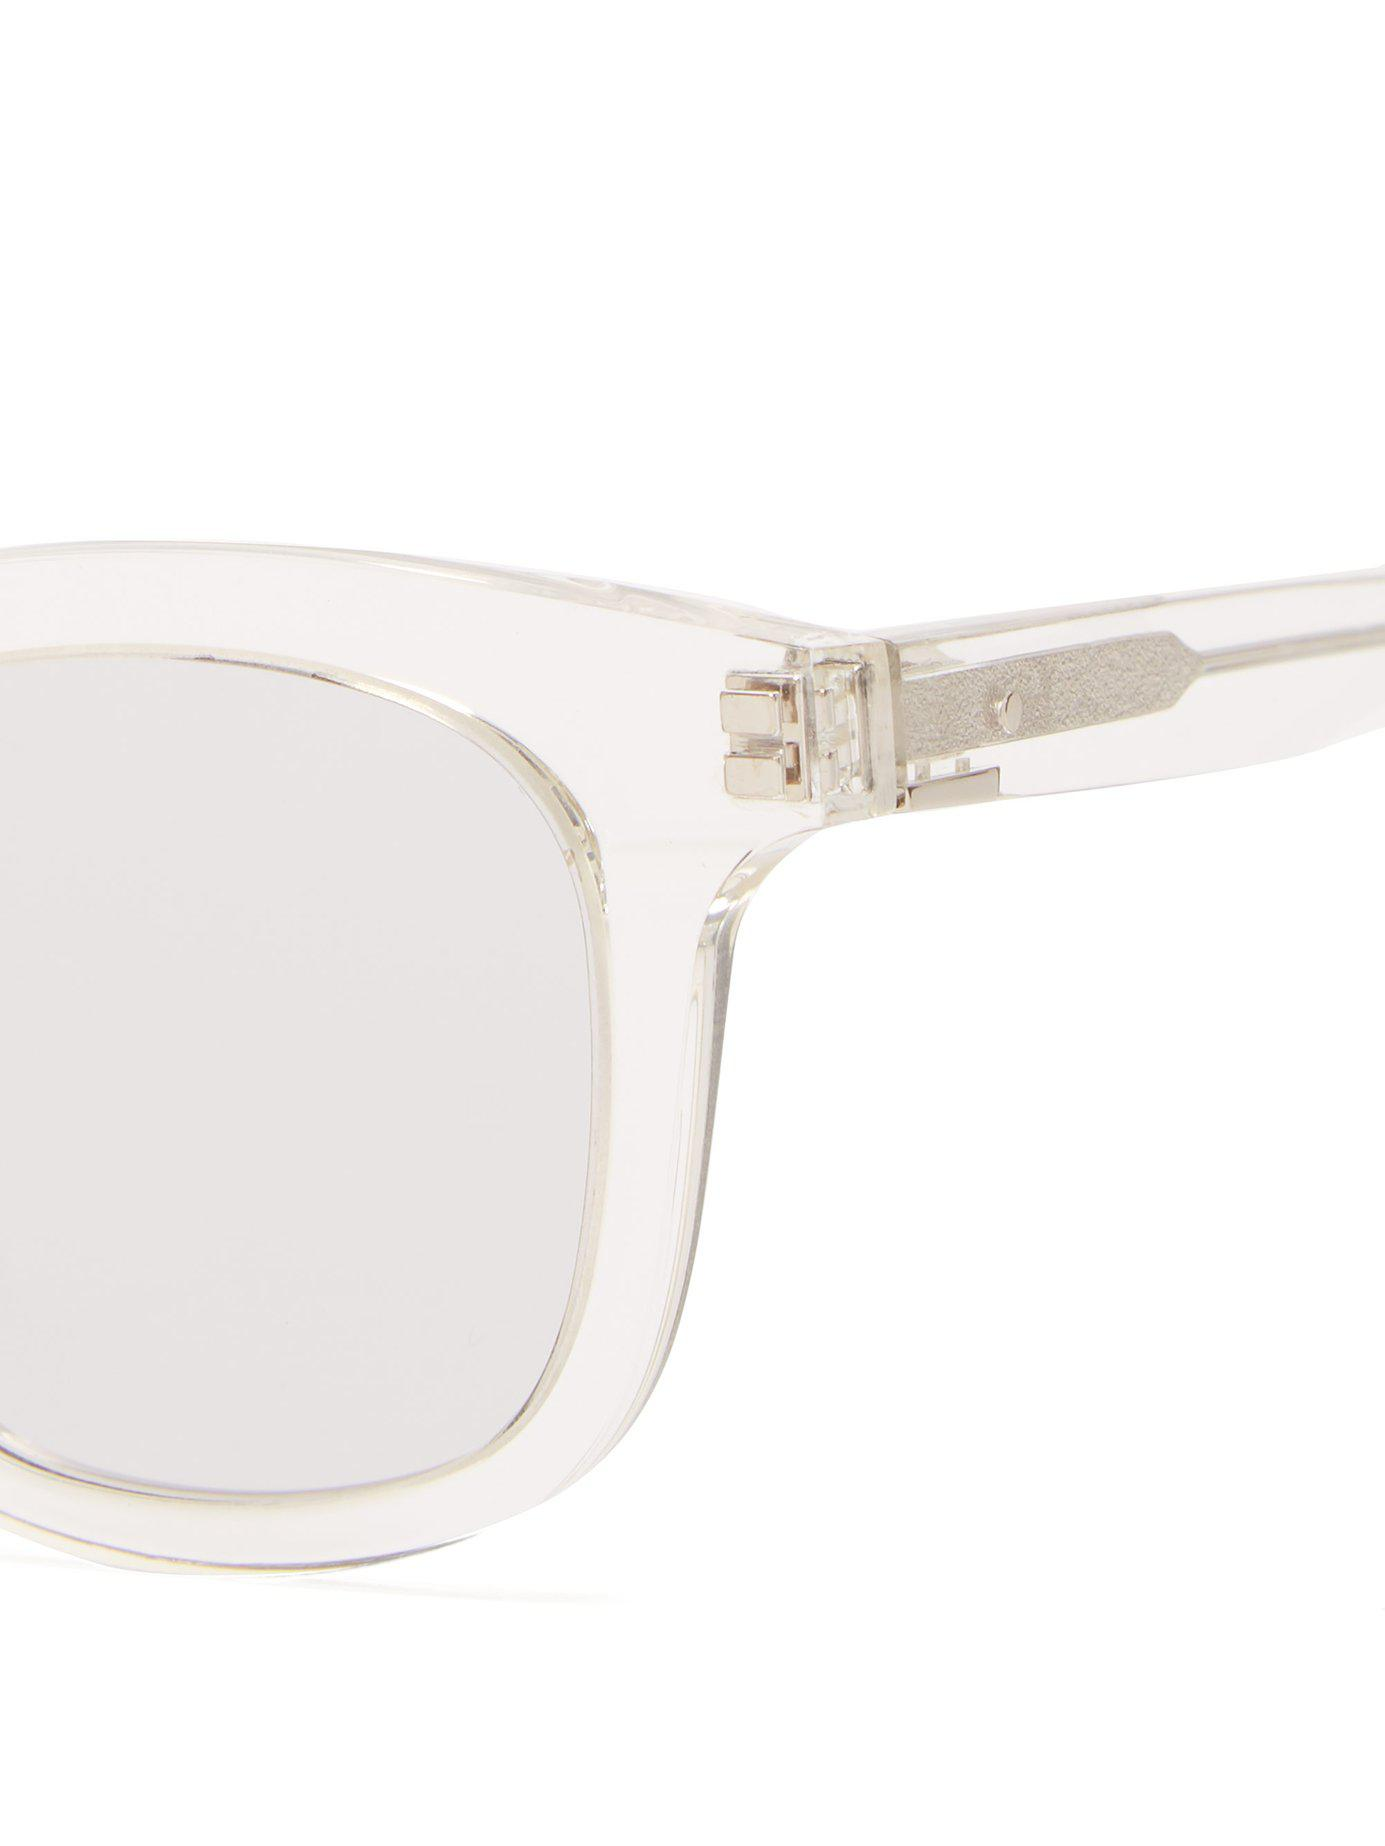 5d6bca58aa Gentle Monster Dal Lake Acetate Glasses in White for Men - Lyst